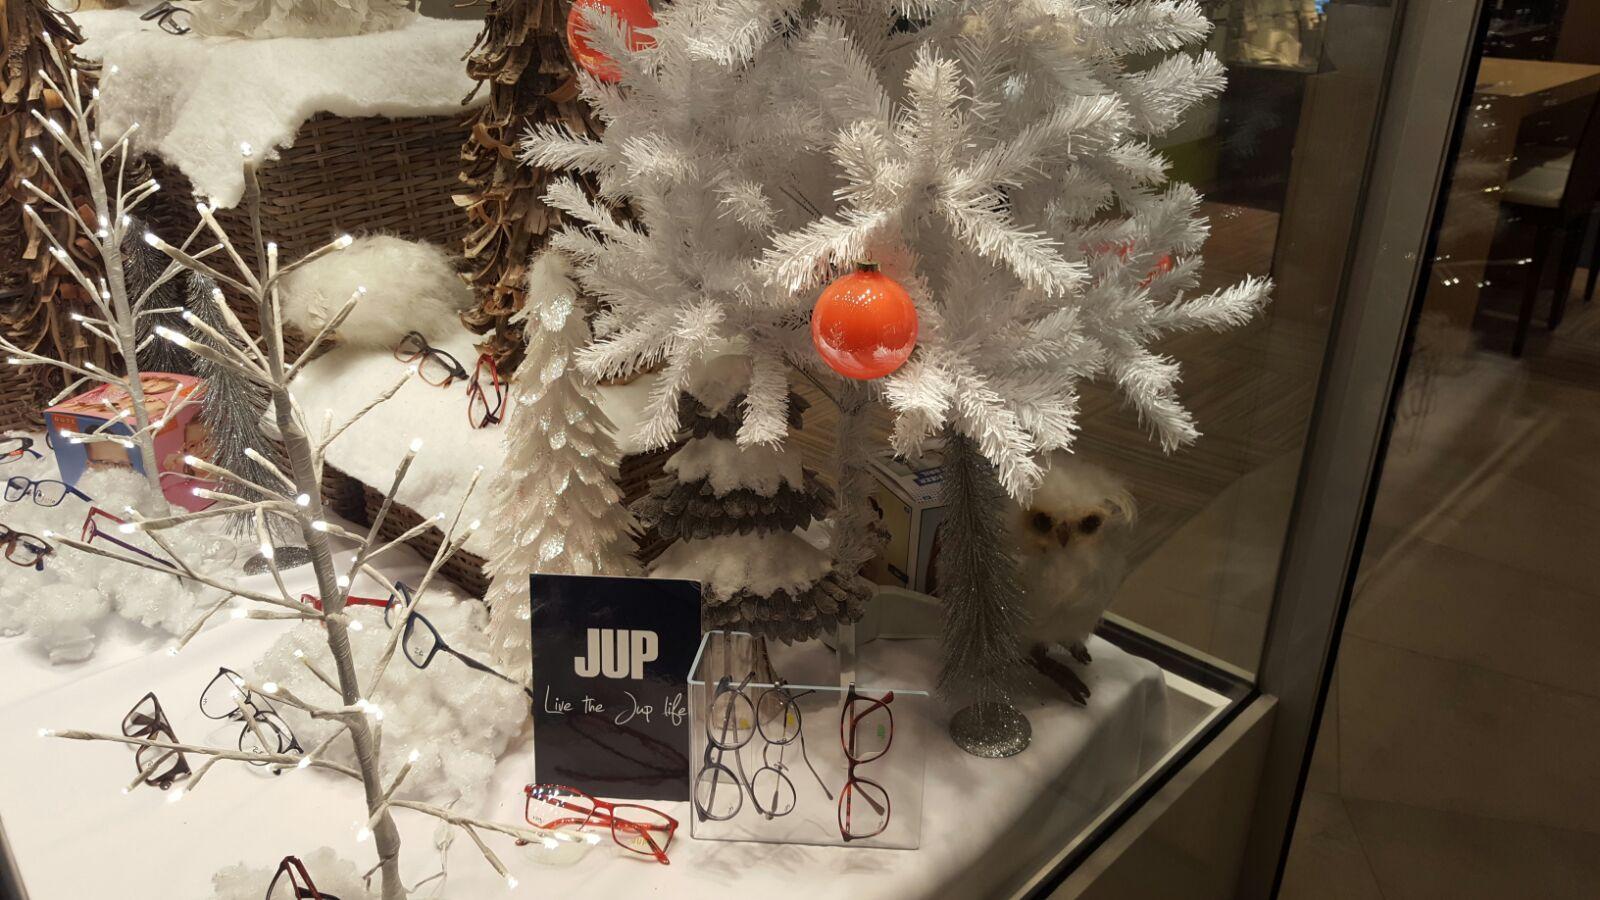 http://www.juwelierbrinkhuis.nl/wp-content/uploads/2016/12/e929e55d-2aff-4f47-8b3d-ab3f66540825.jpg